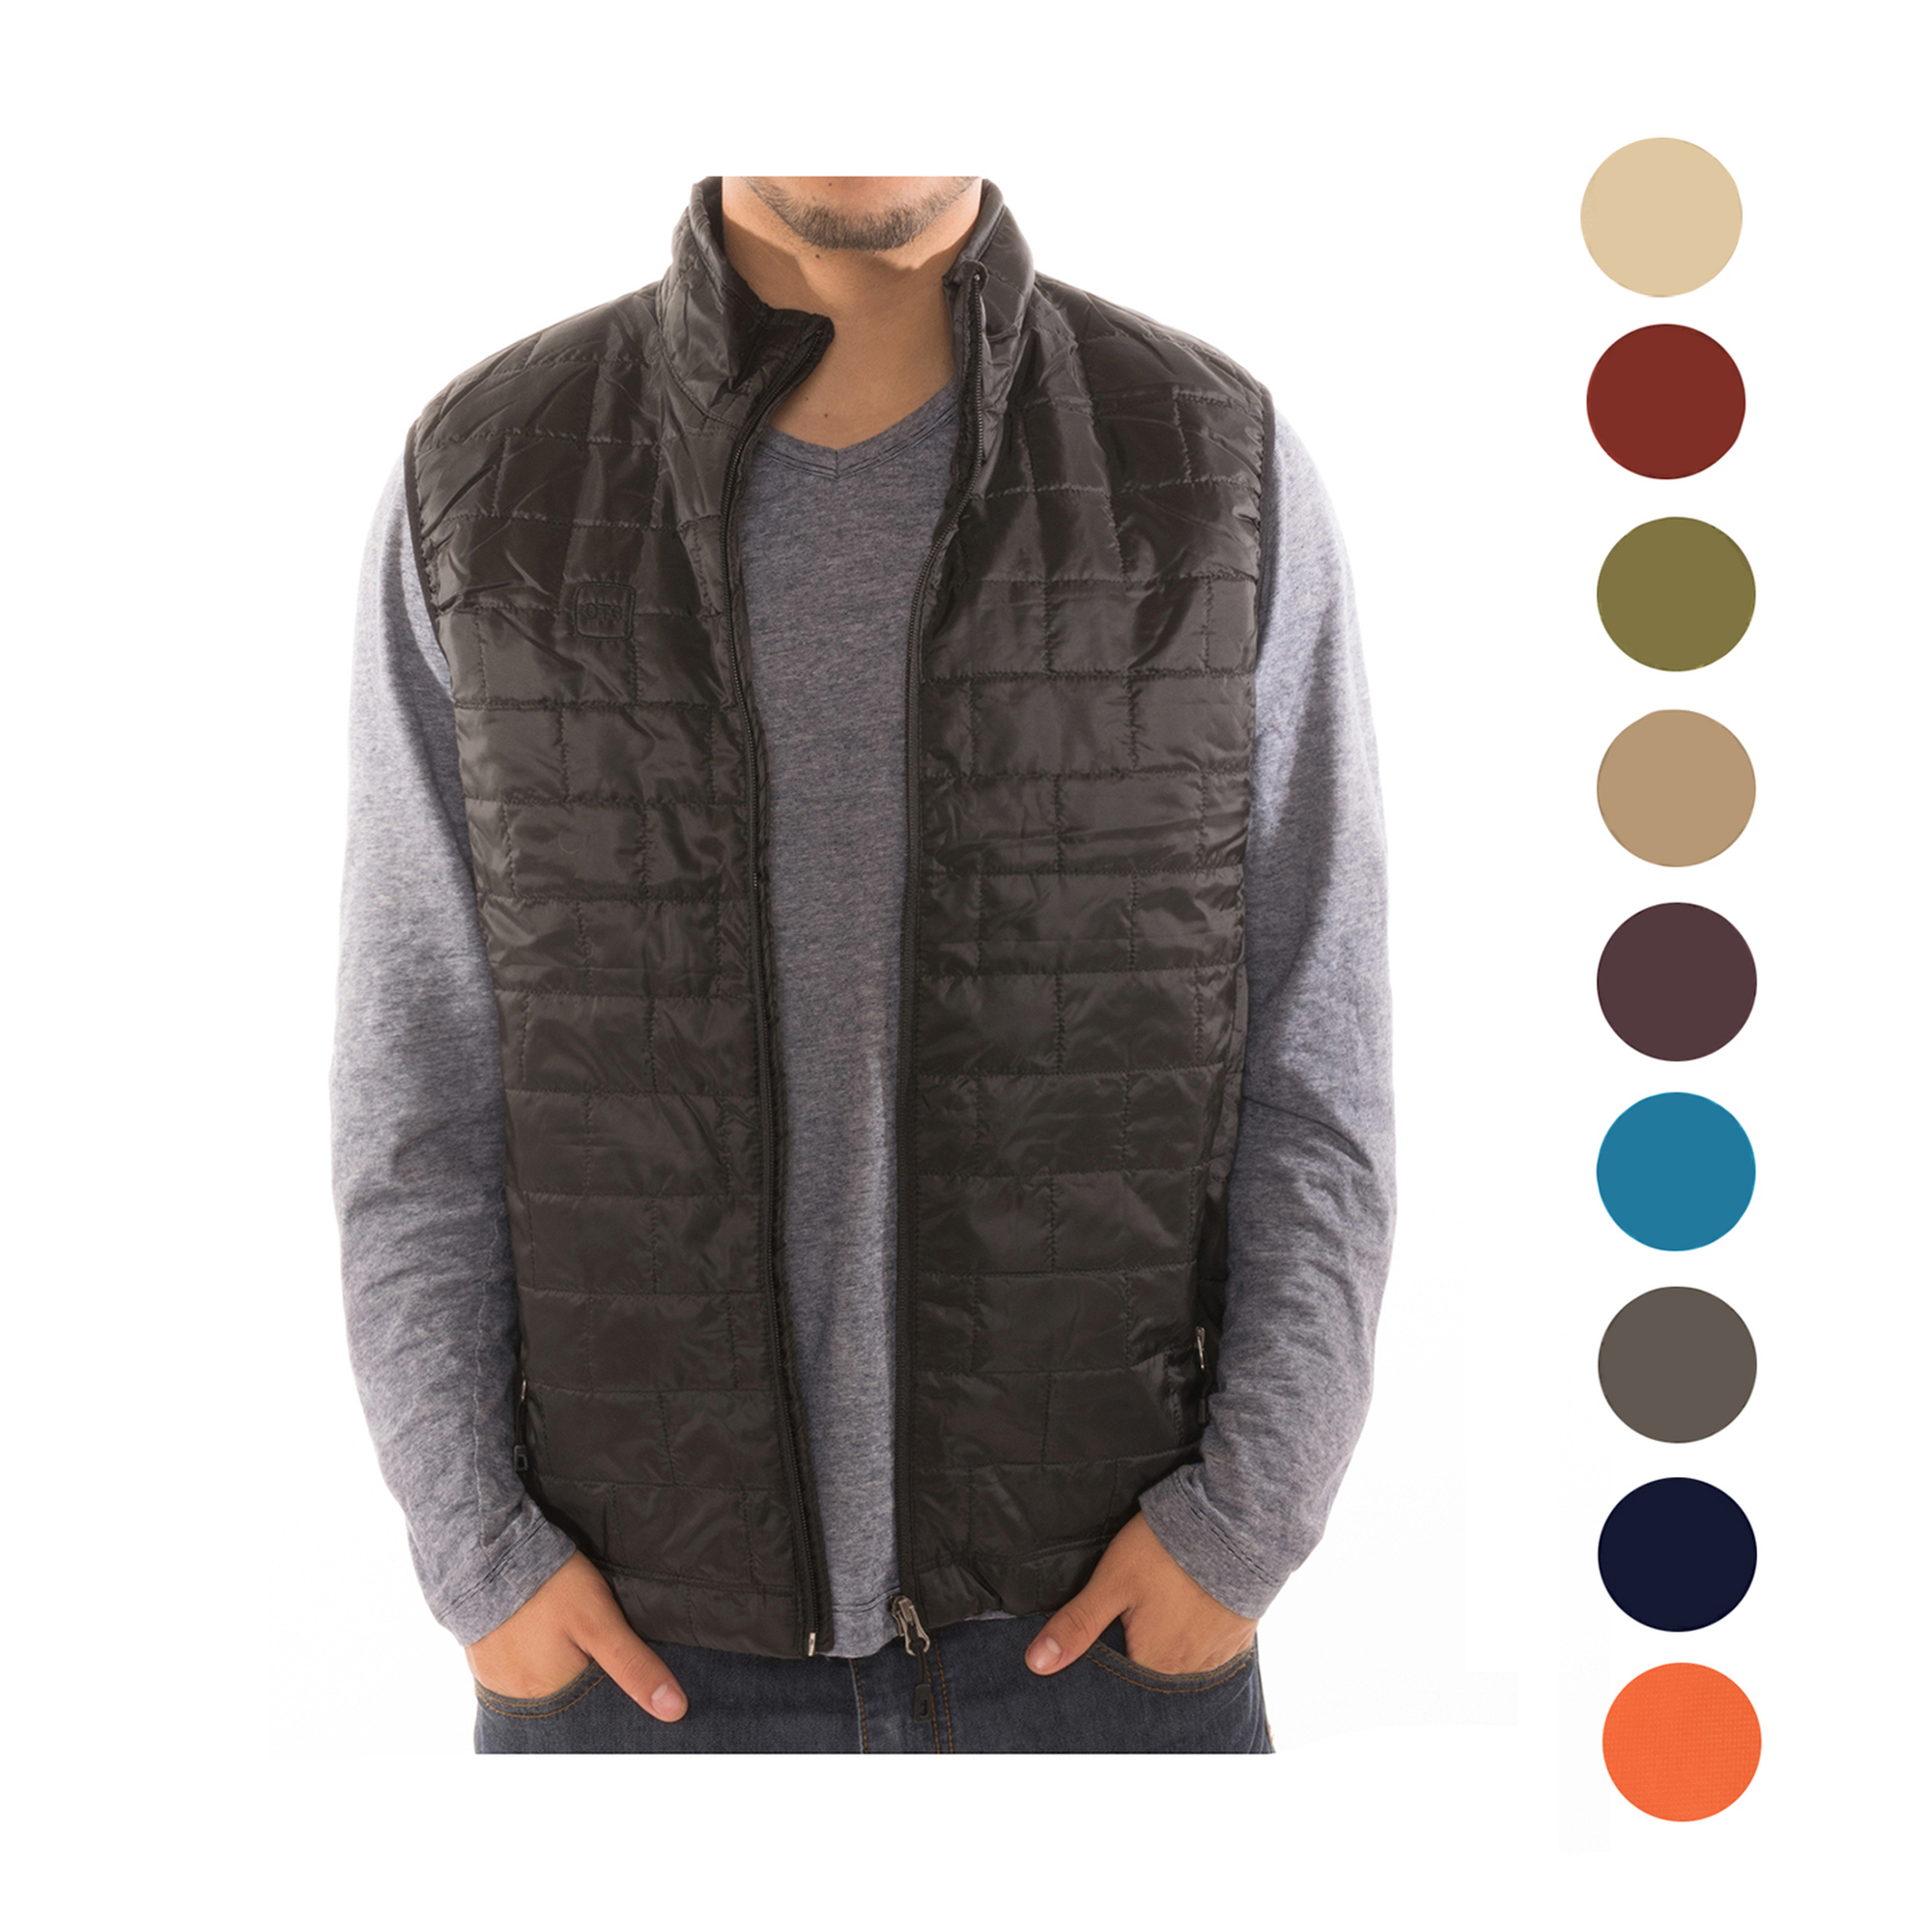 8d330049a457 Men s Puffer Quilted Water Repellent Full Zipper Packable Vest Jacket Coat  - NWT